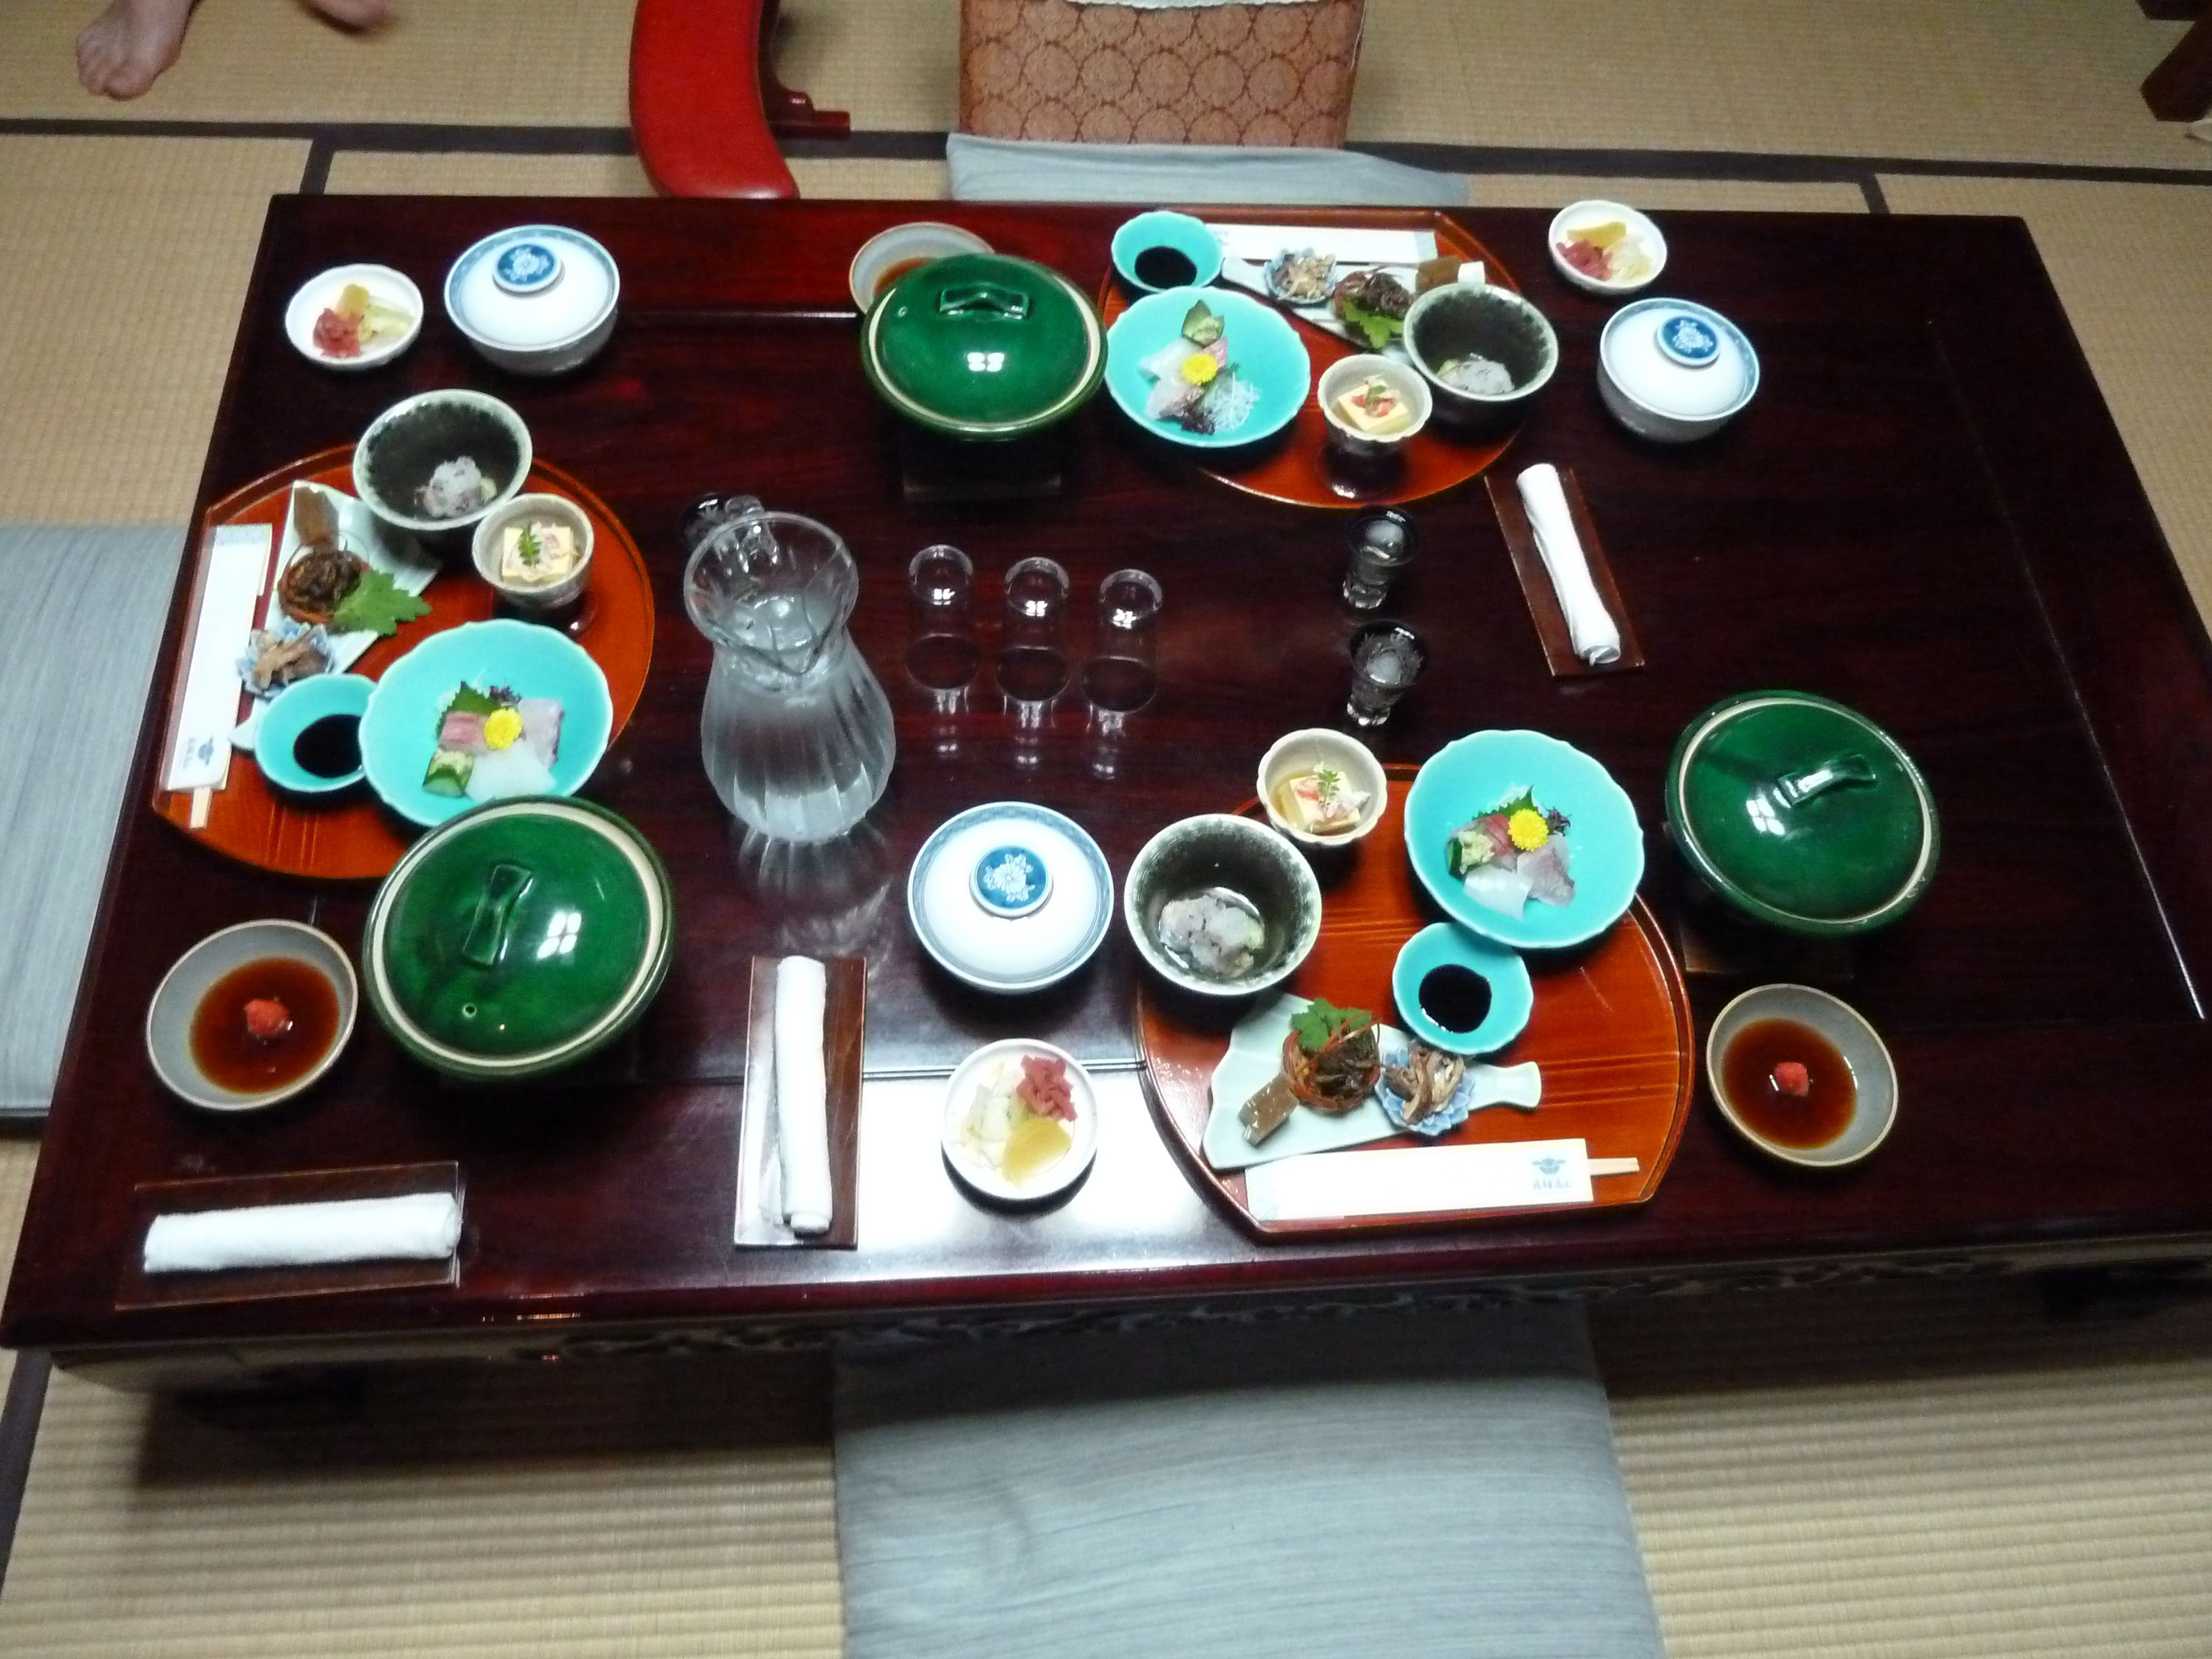 Repas au ryokan, à Takayama